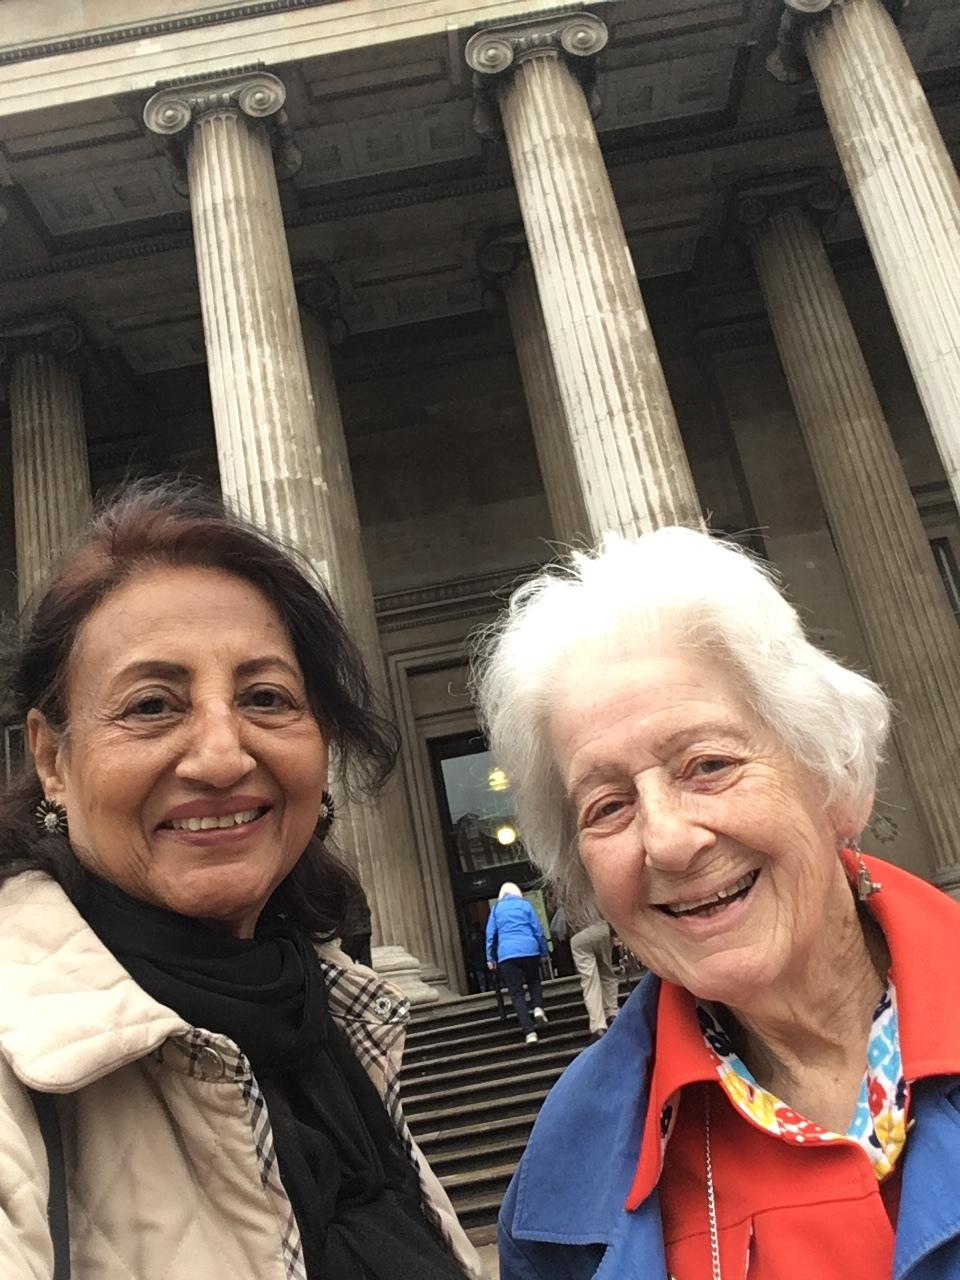 Shahana and fellow OPAG member Elizabeth Ann visit the British Museum